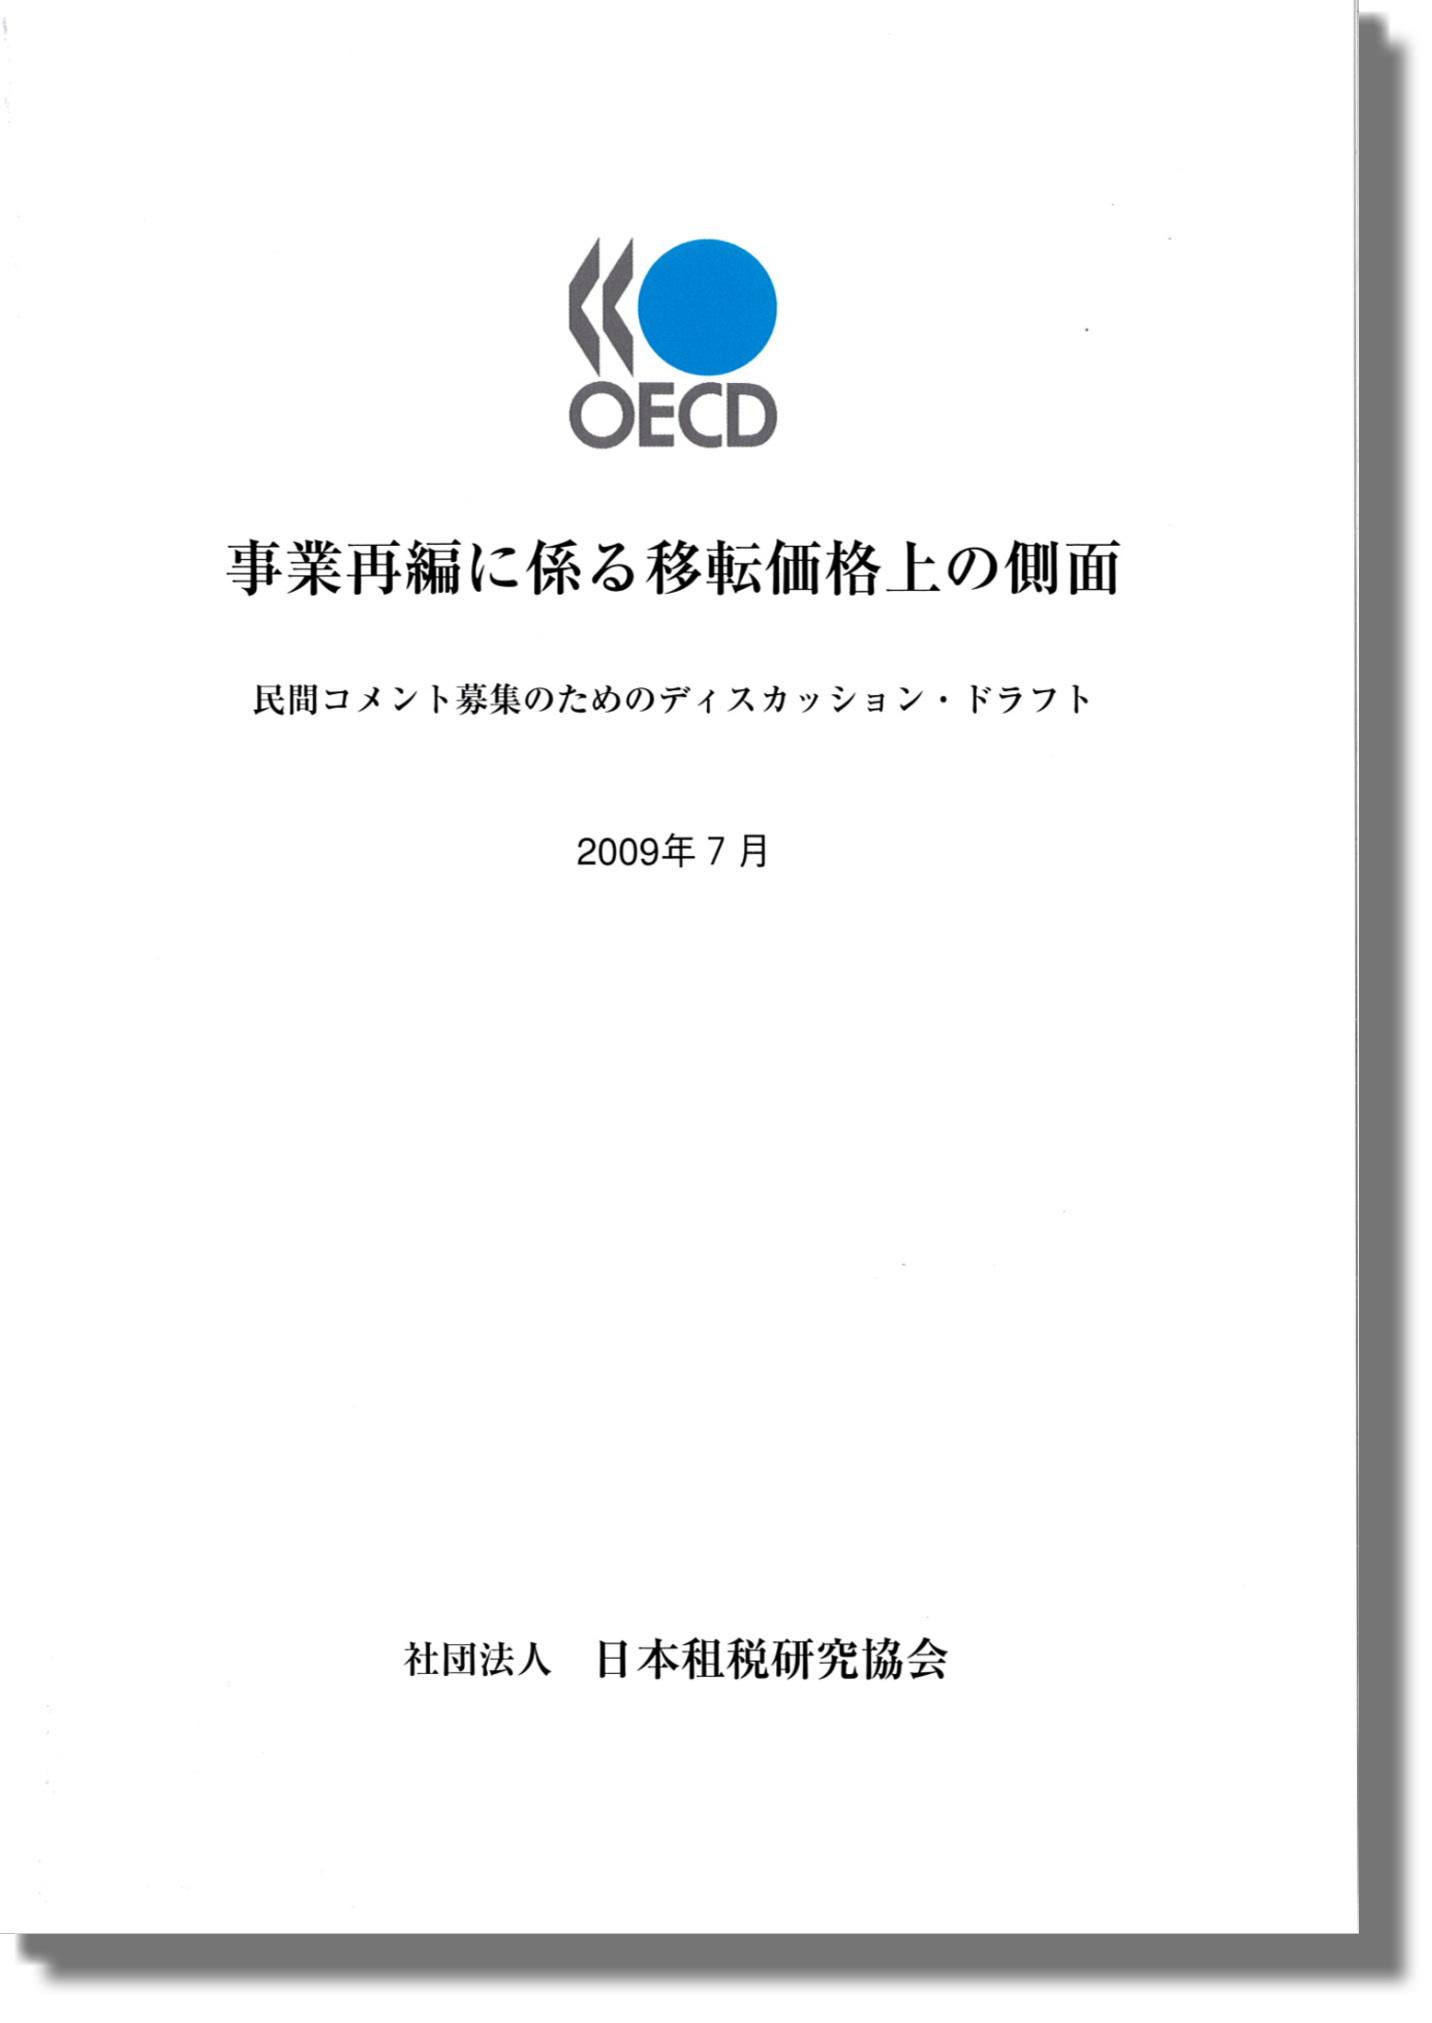 OECD 事業再編に係る移転価格上の側面-民間コメント募集のためのディスカッションドラフト